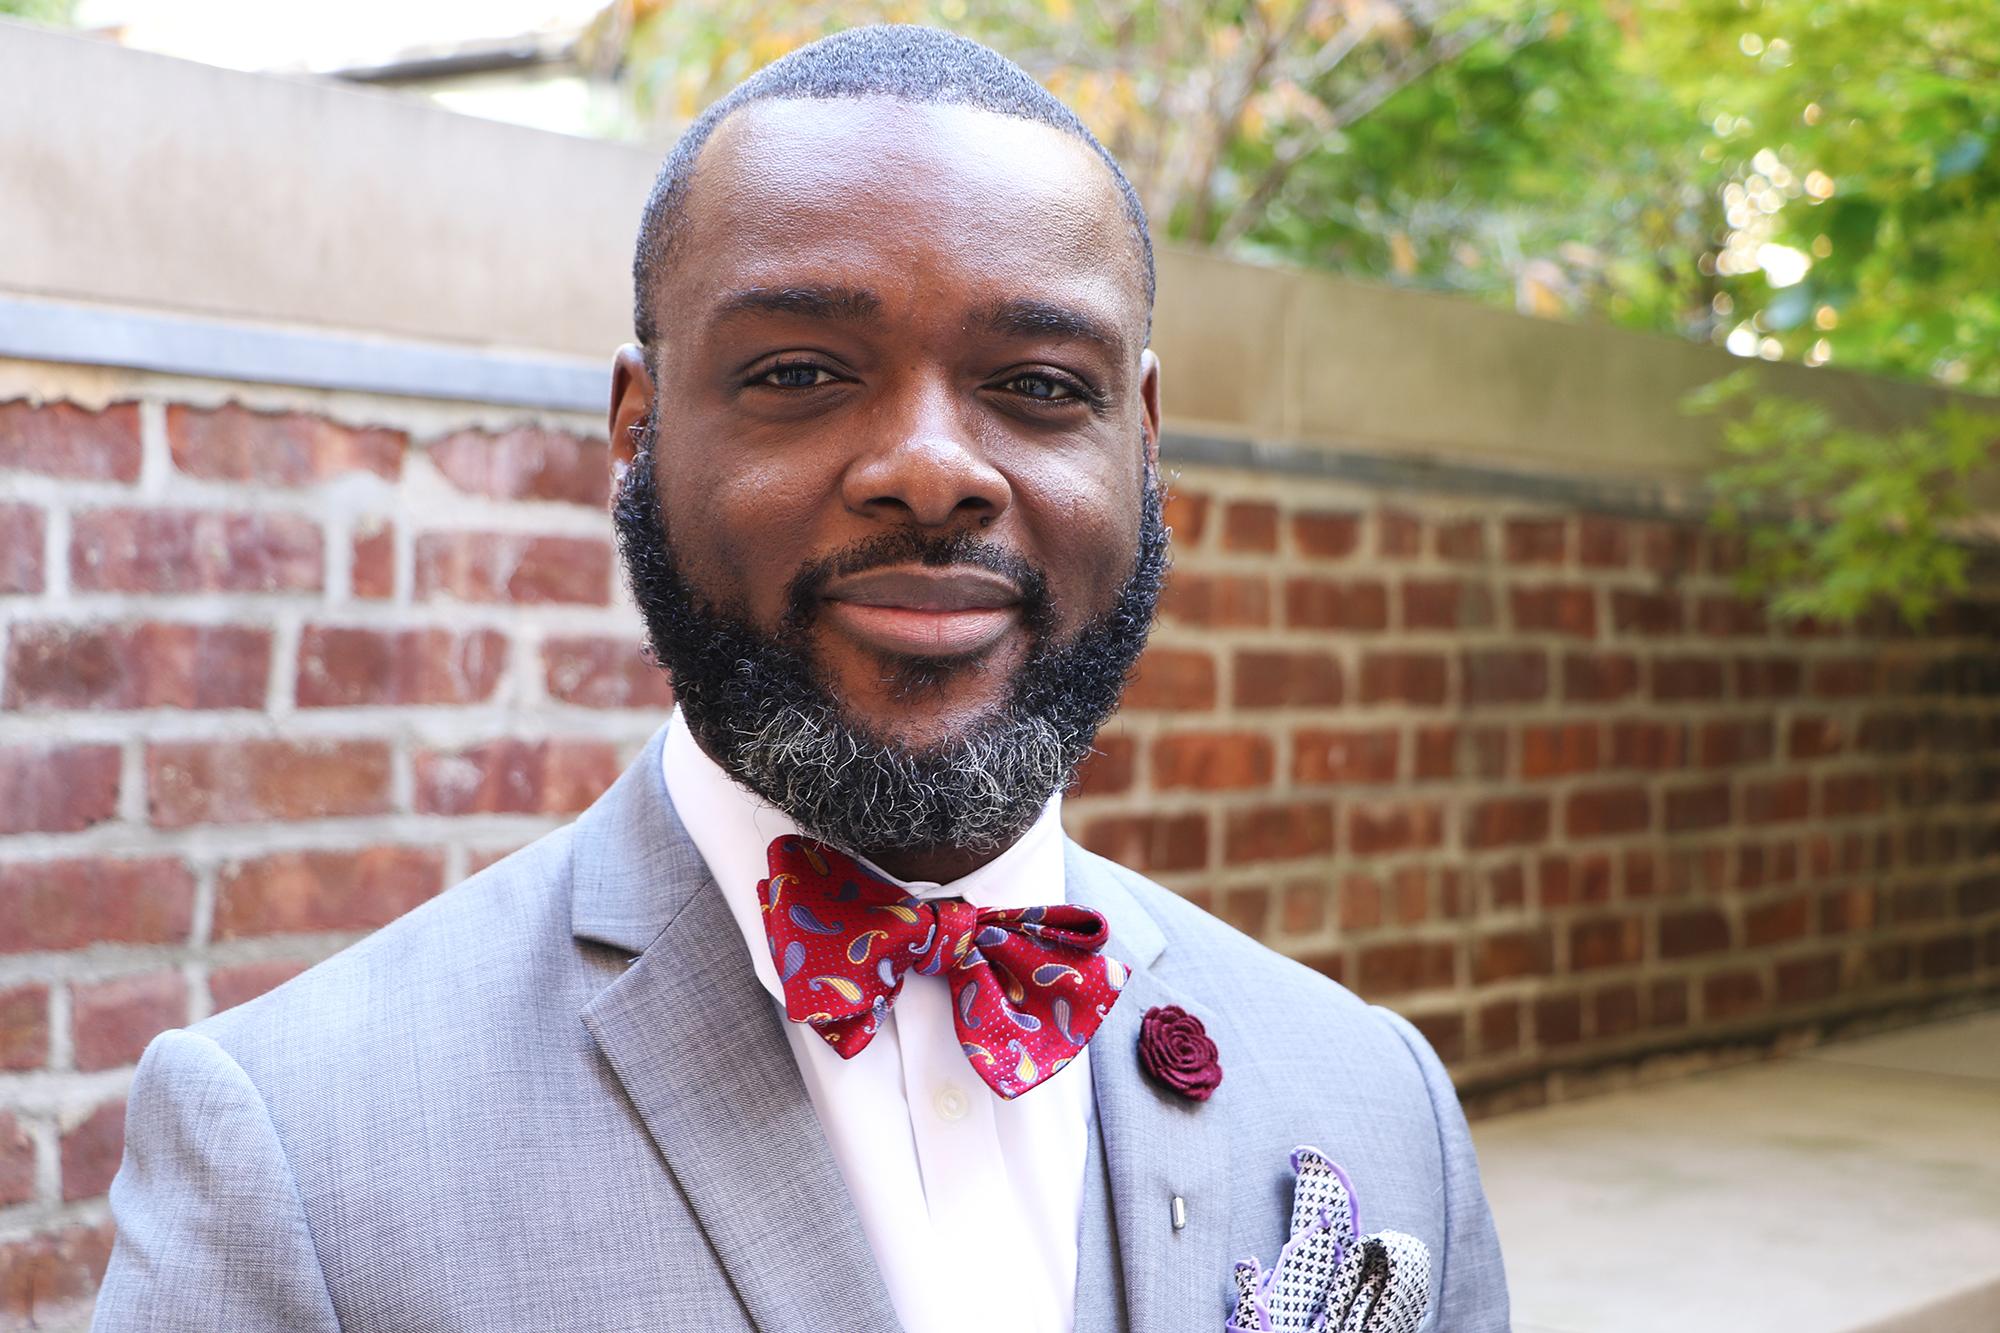 Uchechukwu Lawrence Njoku